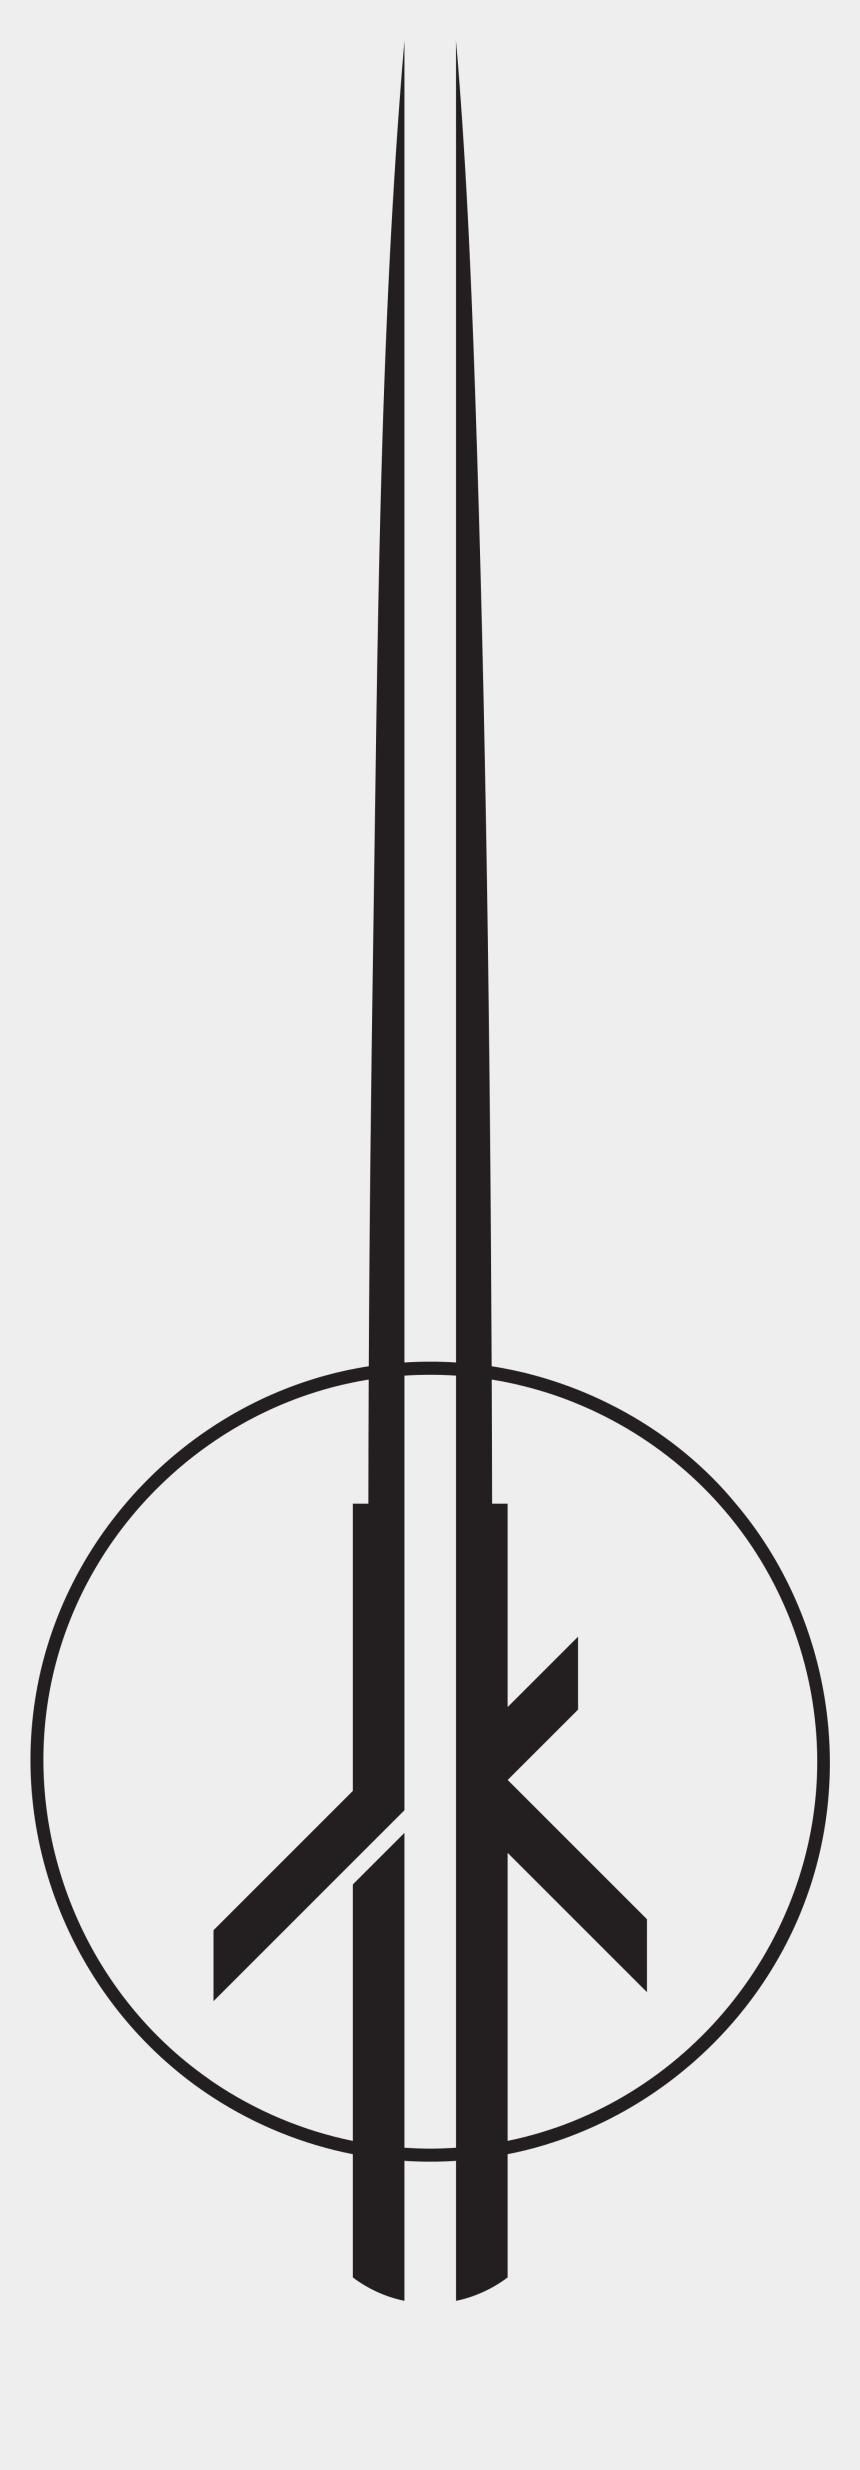 lightsaber clipart, Cartoons - Lightsaber Clipart Svg - Star Wars Lightsaber Symbol